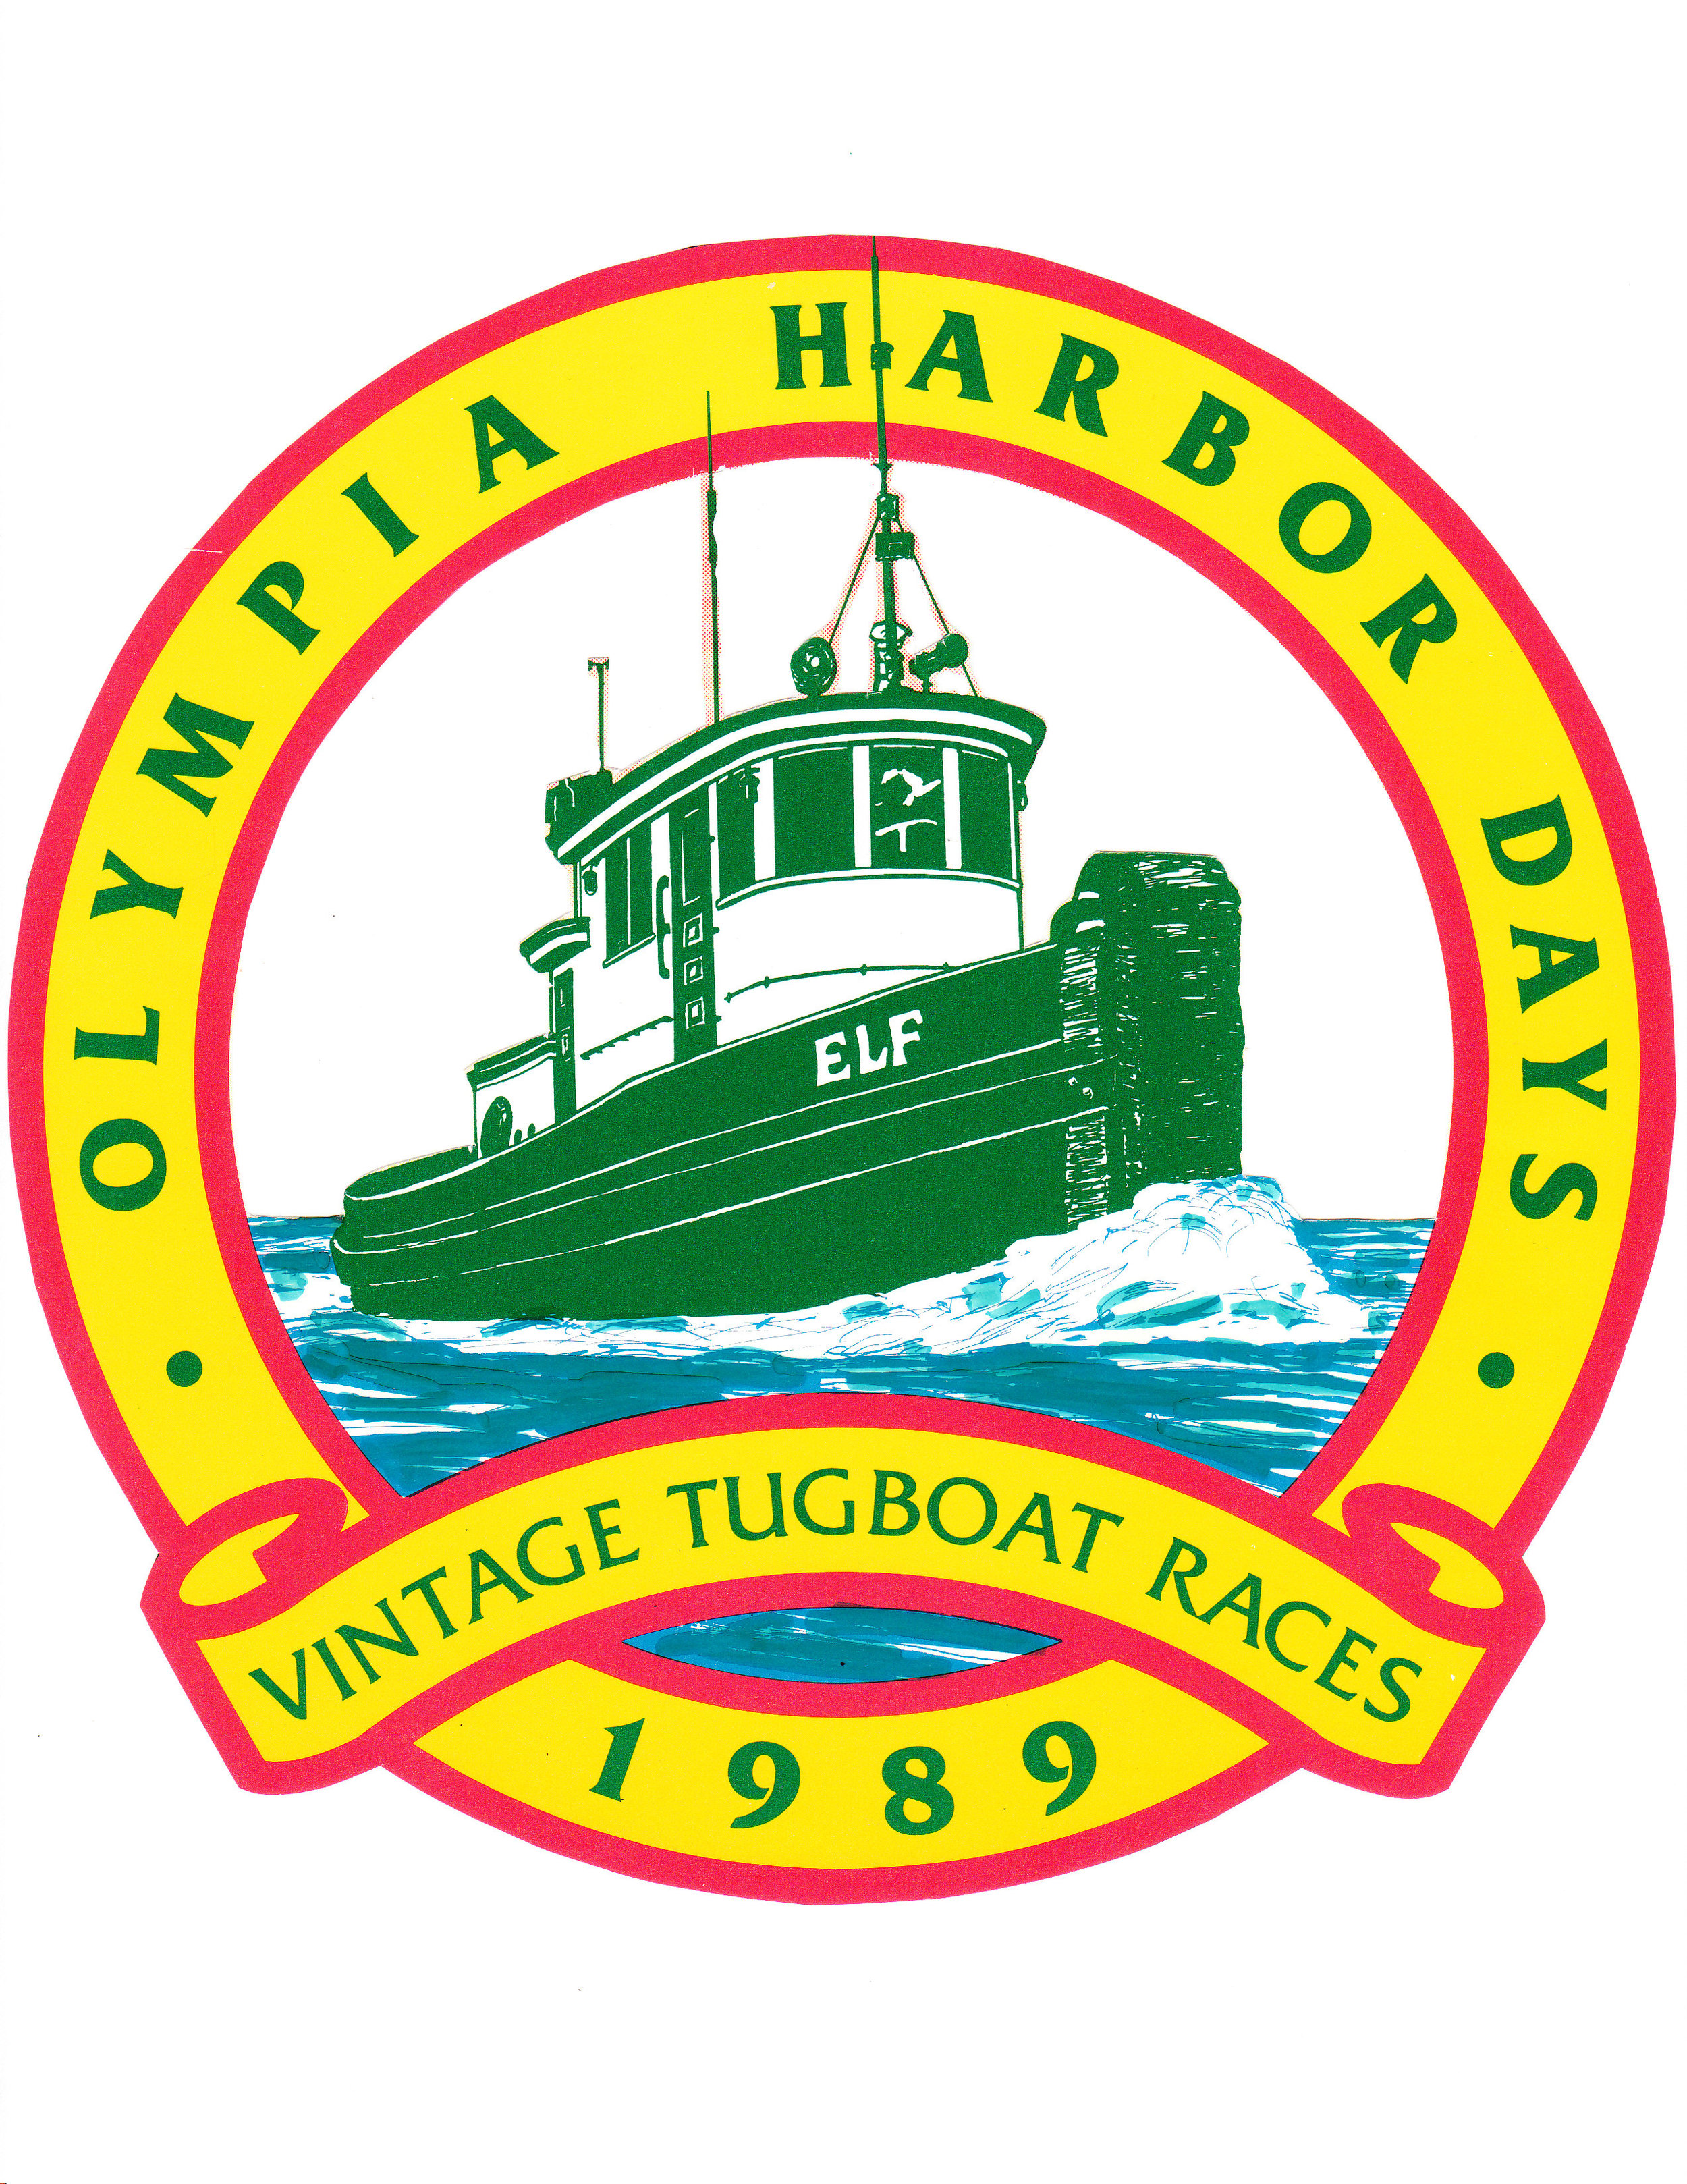 1989 Olympia Harbor Days Logo Featuring Tug Elf